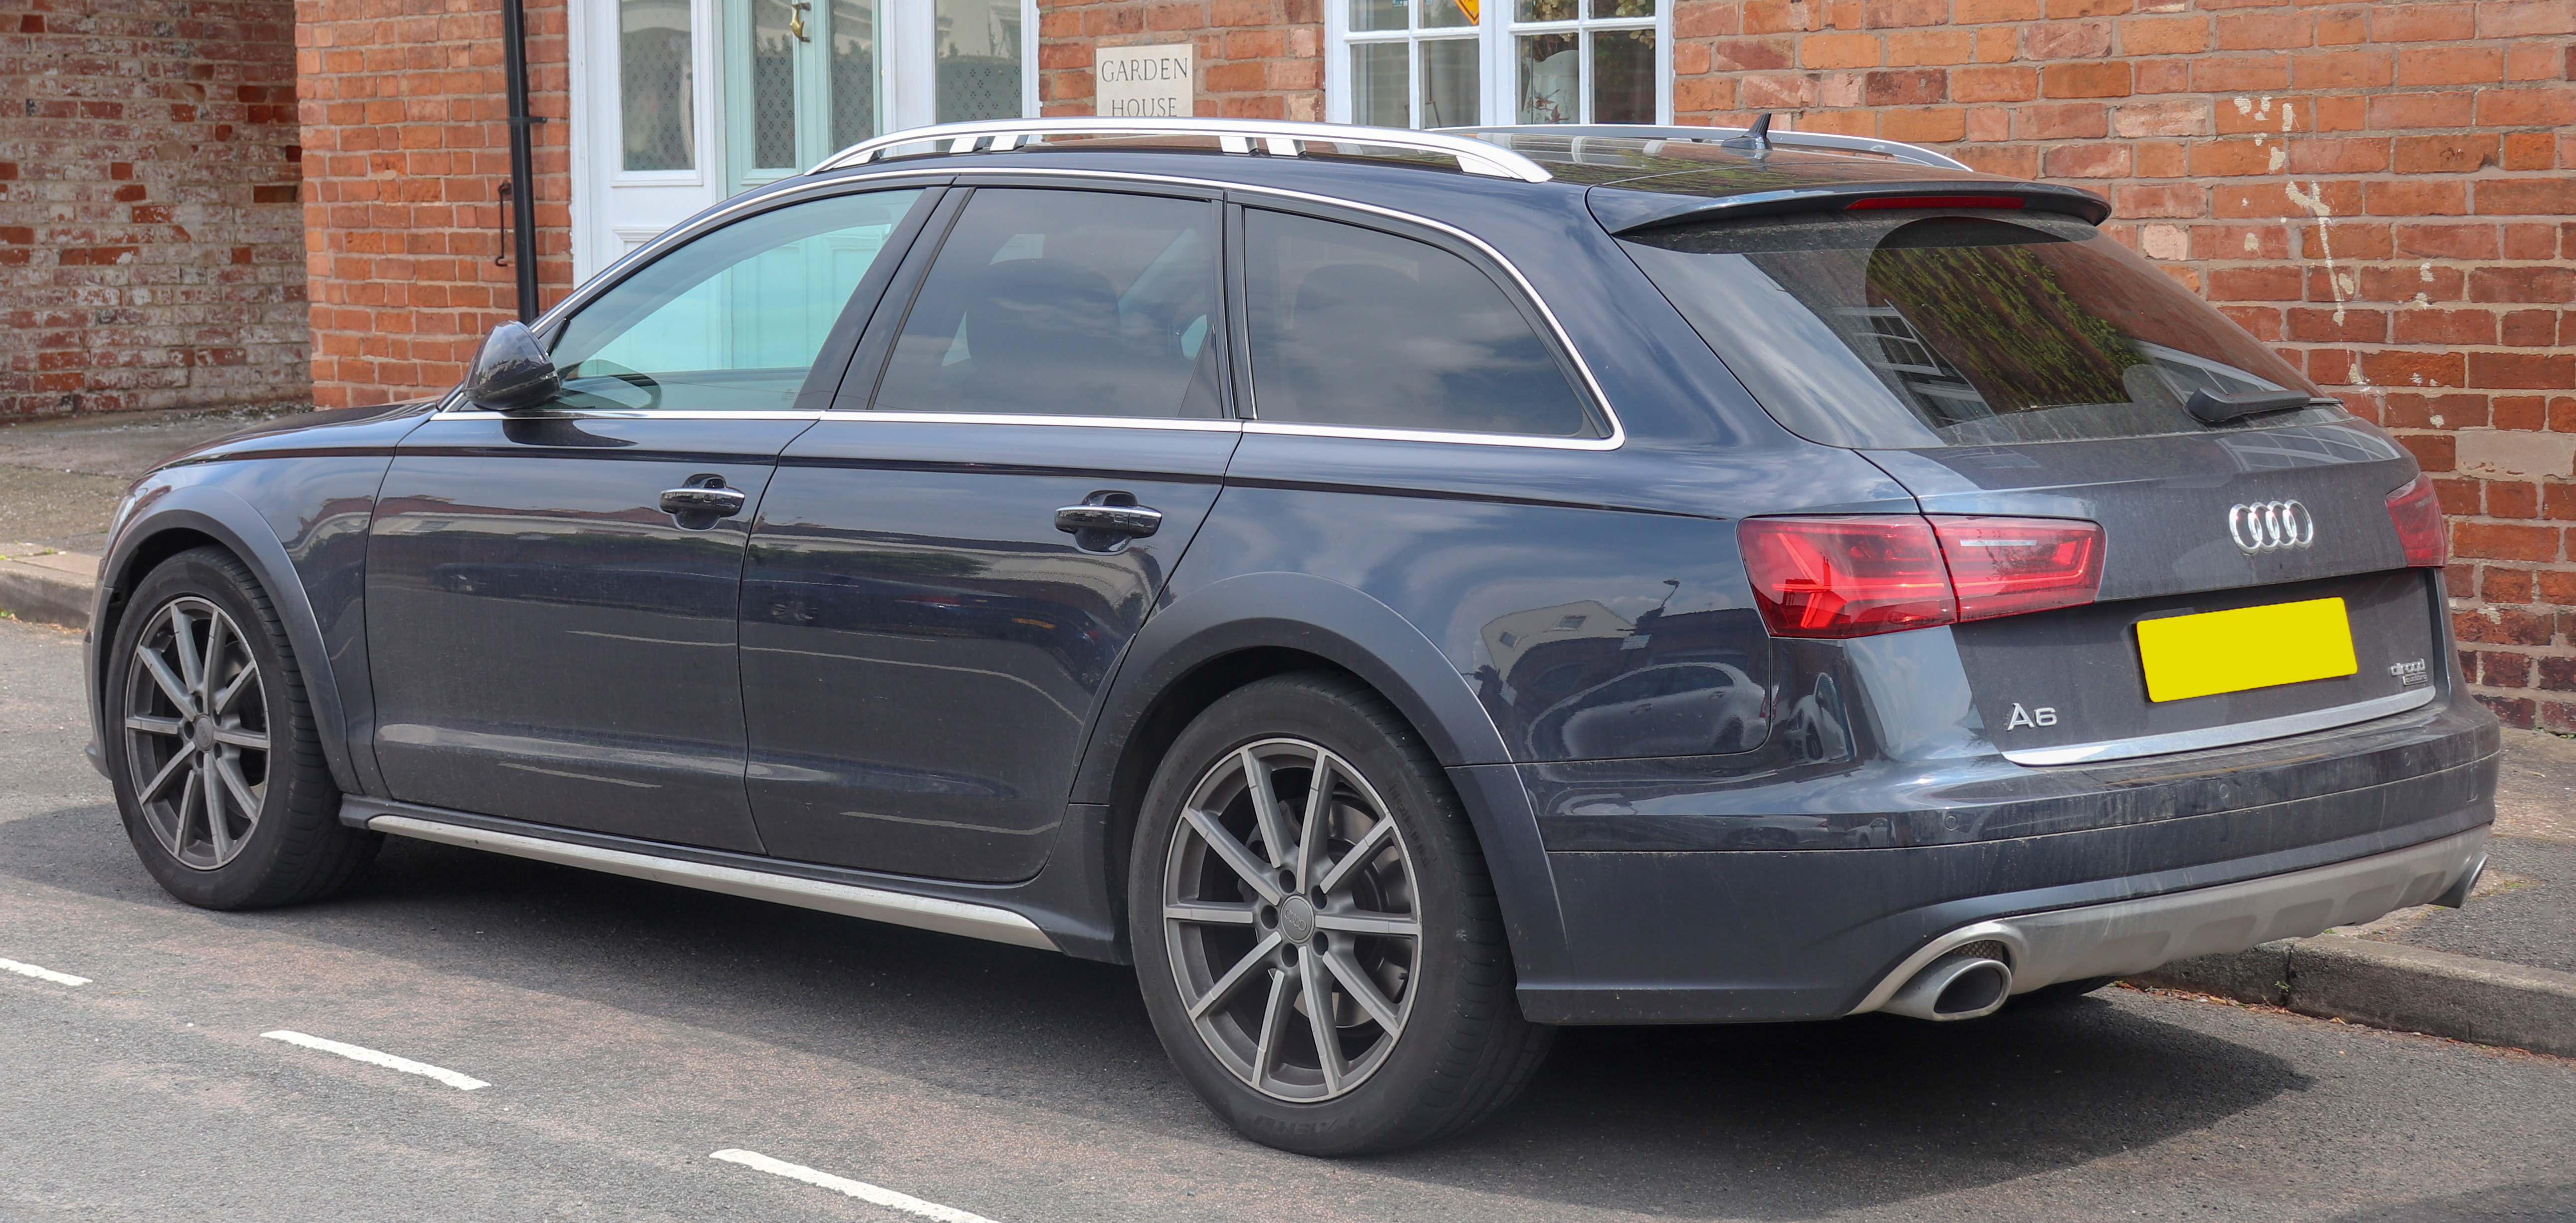 Kelebihan Kekurangan Audi A6 Allroad 2017 Murah Berkualitas